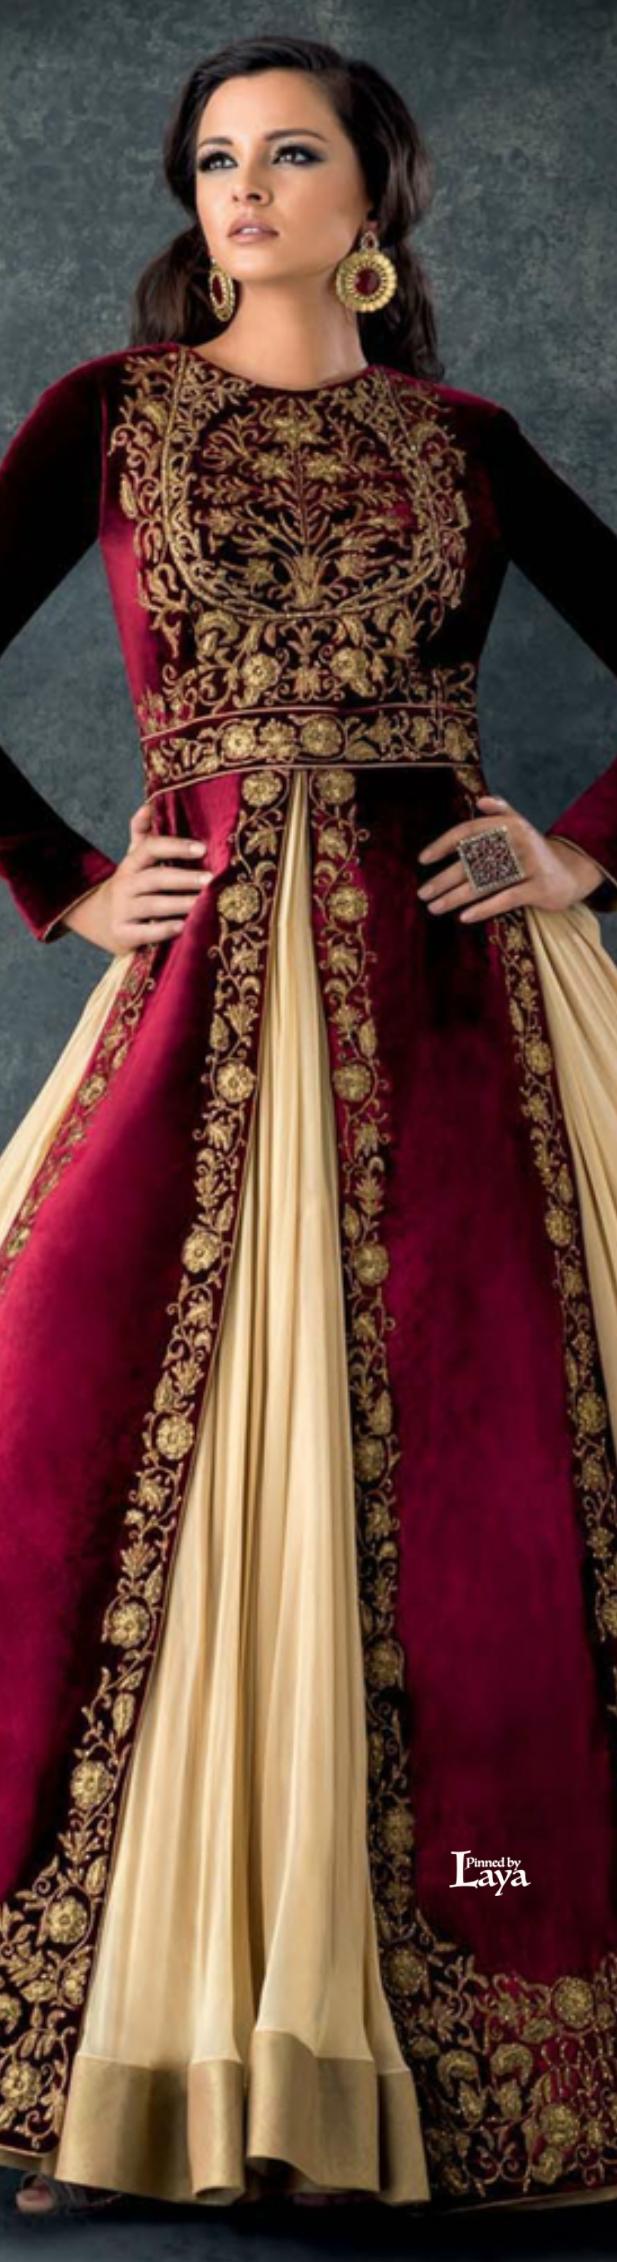 ❋*✿.Asiana.BRIDAL Lehenga.✿*❋. | Anarkali | Pinterest | Bridal ...